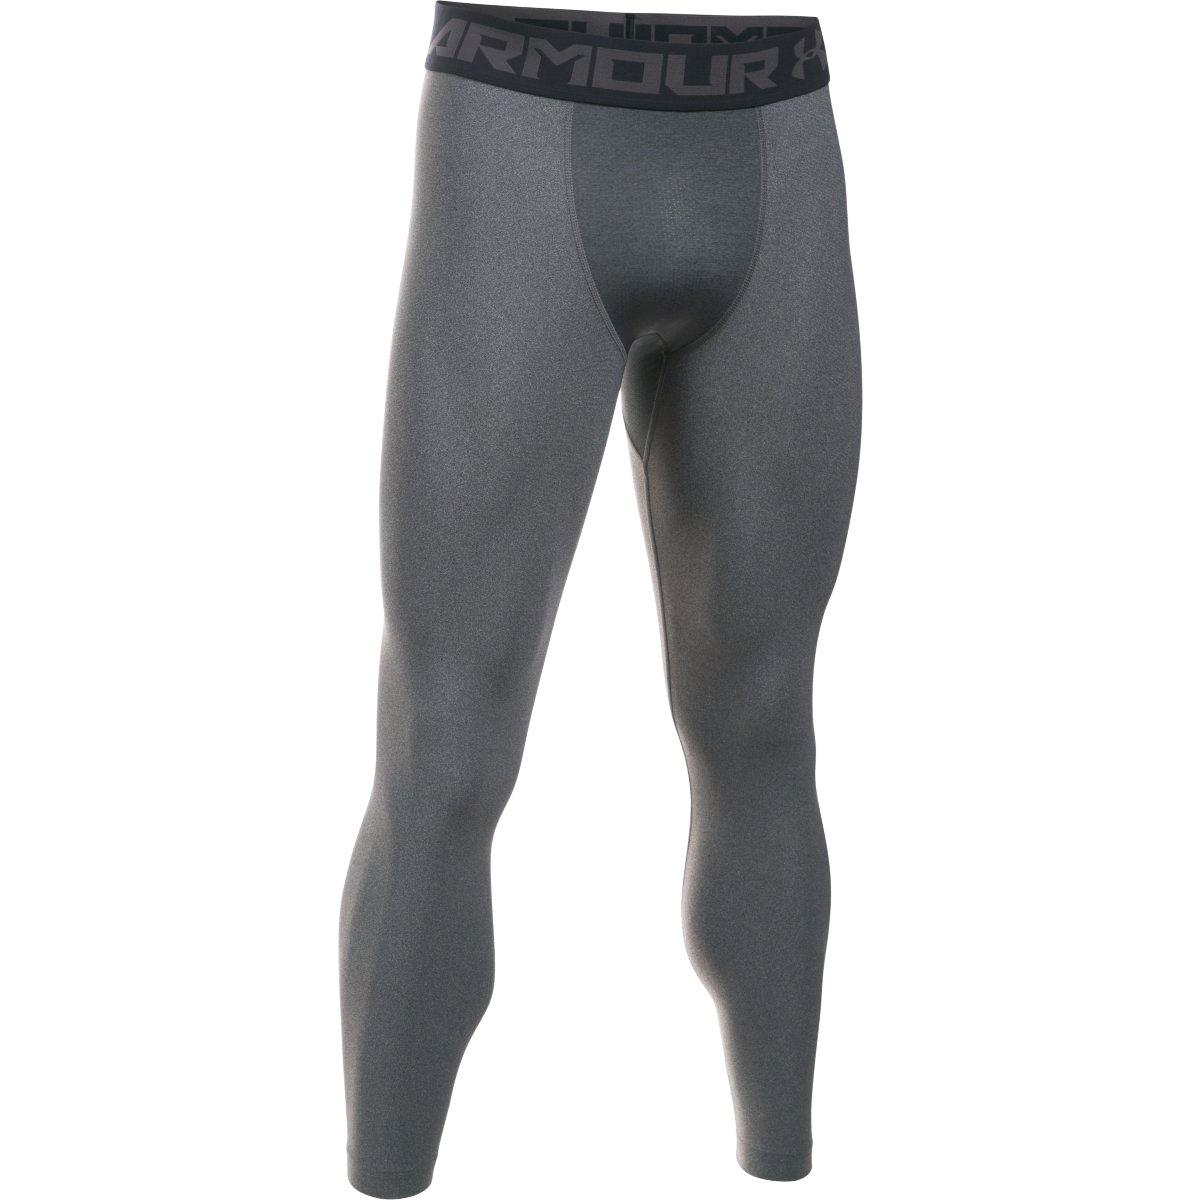 Quần lót nam Under Armour HeatGear Armour 2.0 Legging Carbon Heather/Black